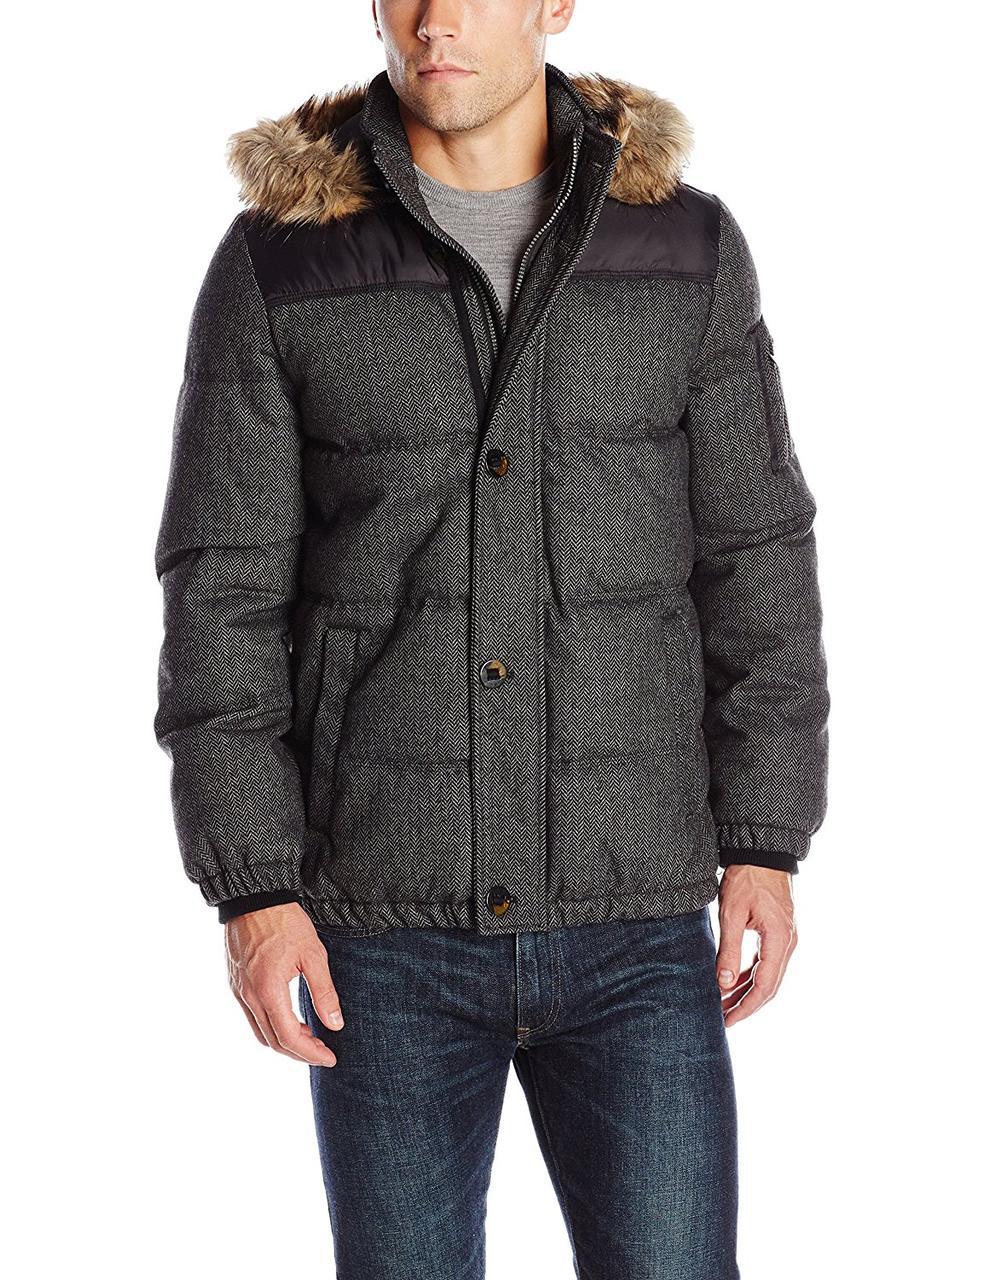 Куртка Buffalo David Bitton, XL, Charcoal, B028593